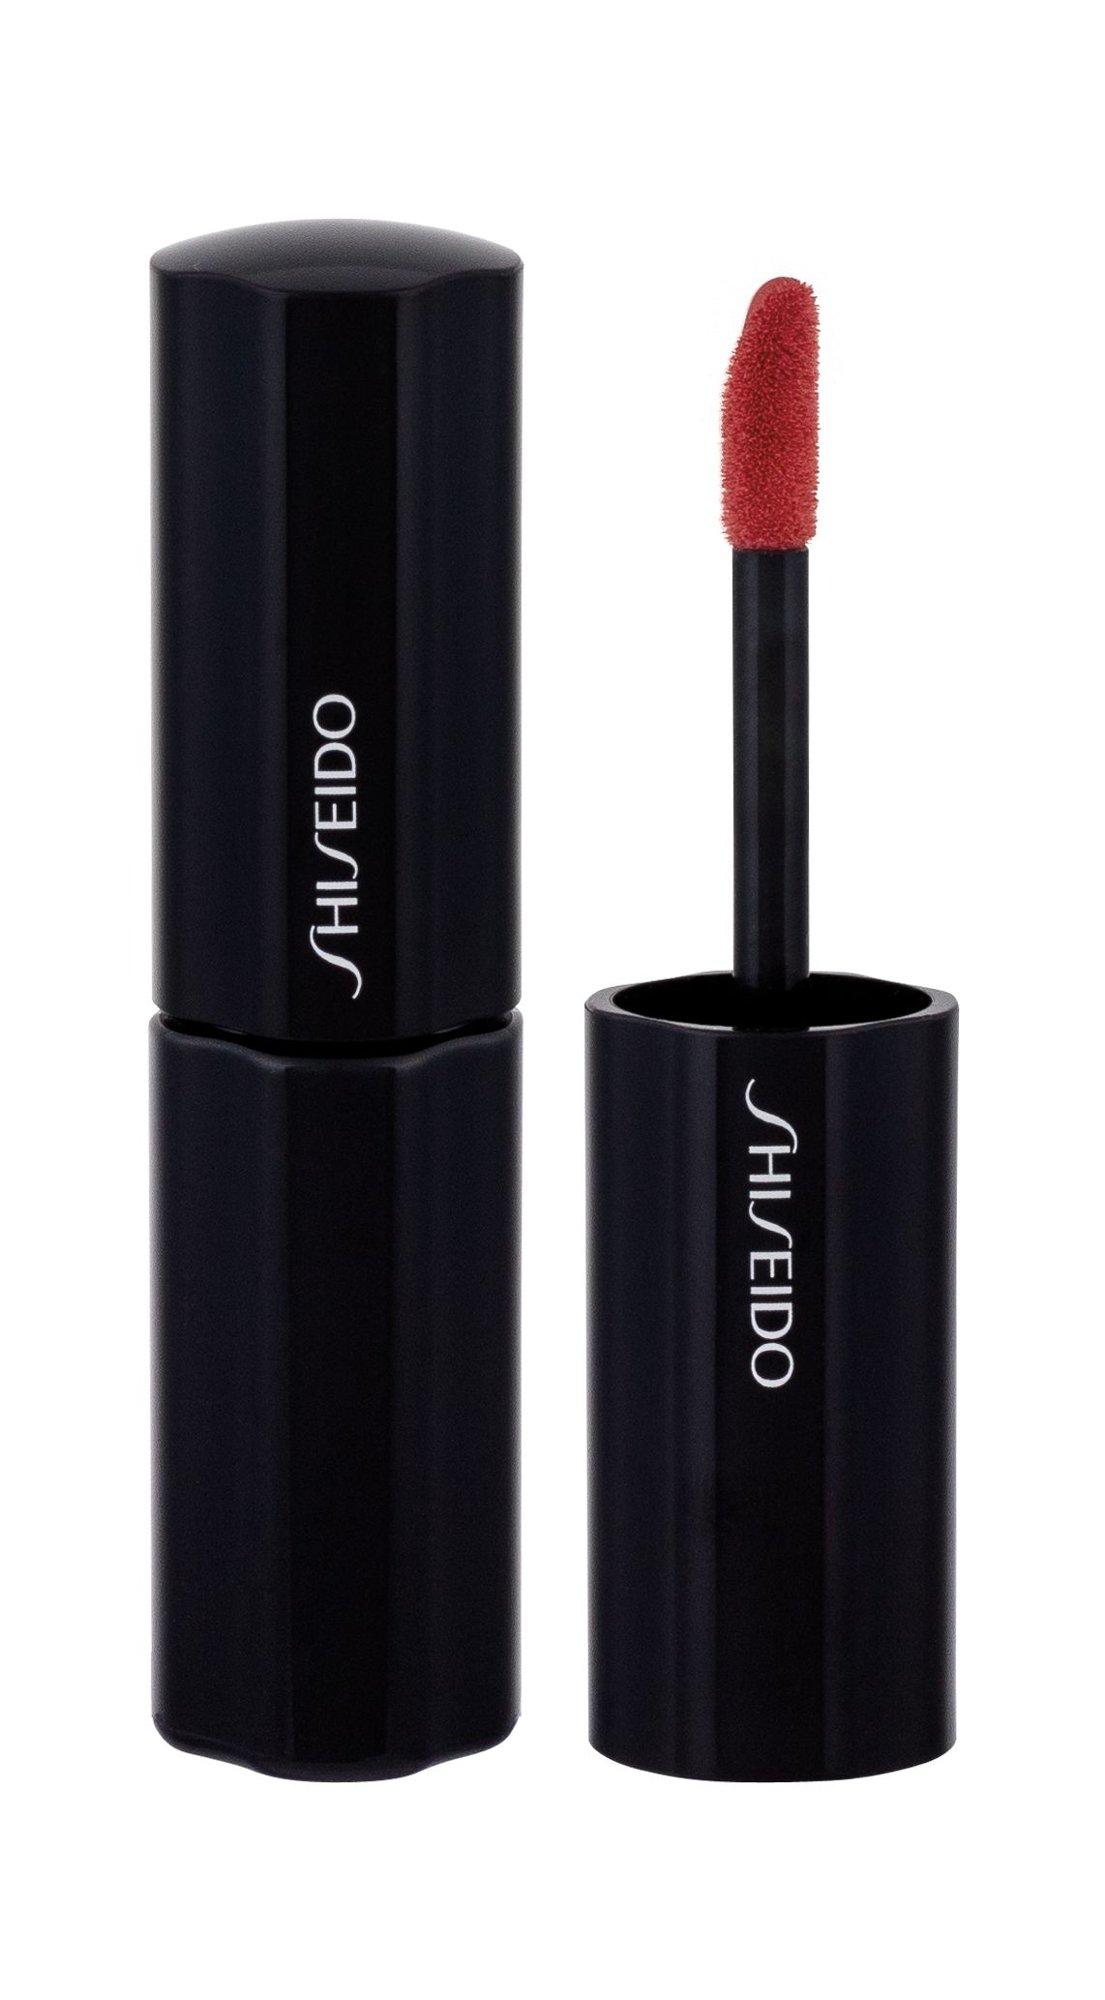 Shiseido Lacquer Rouge Lipstick 6ml RD314